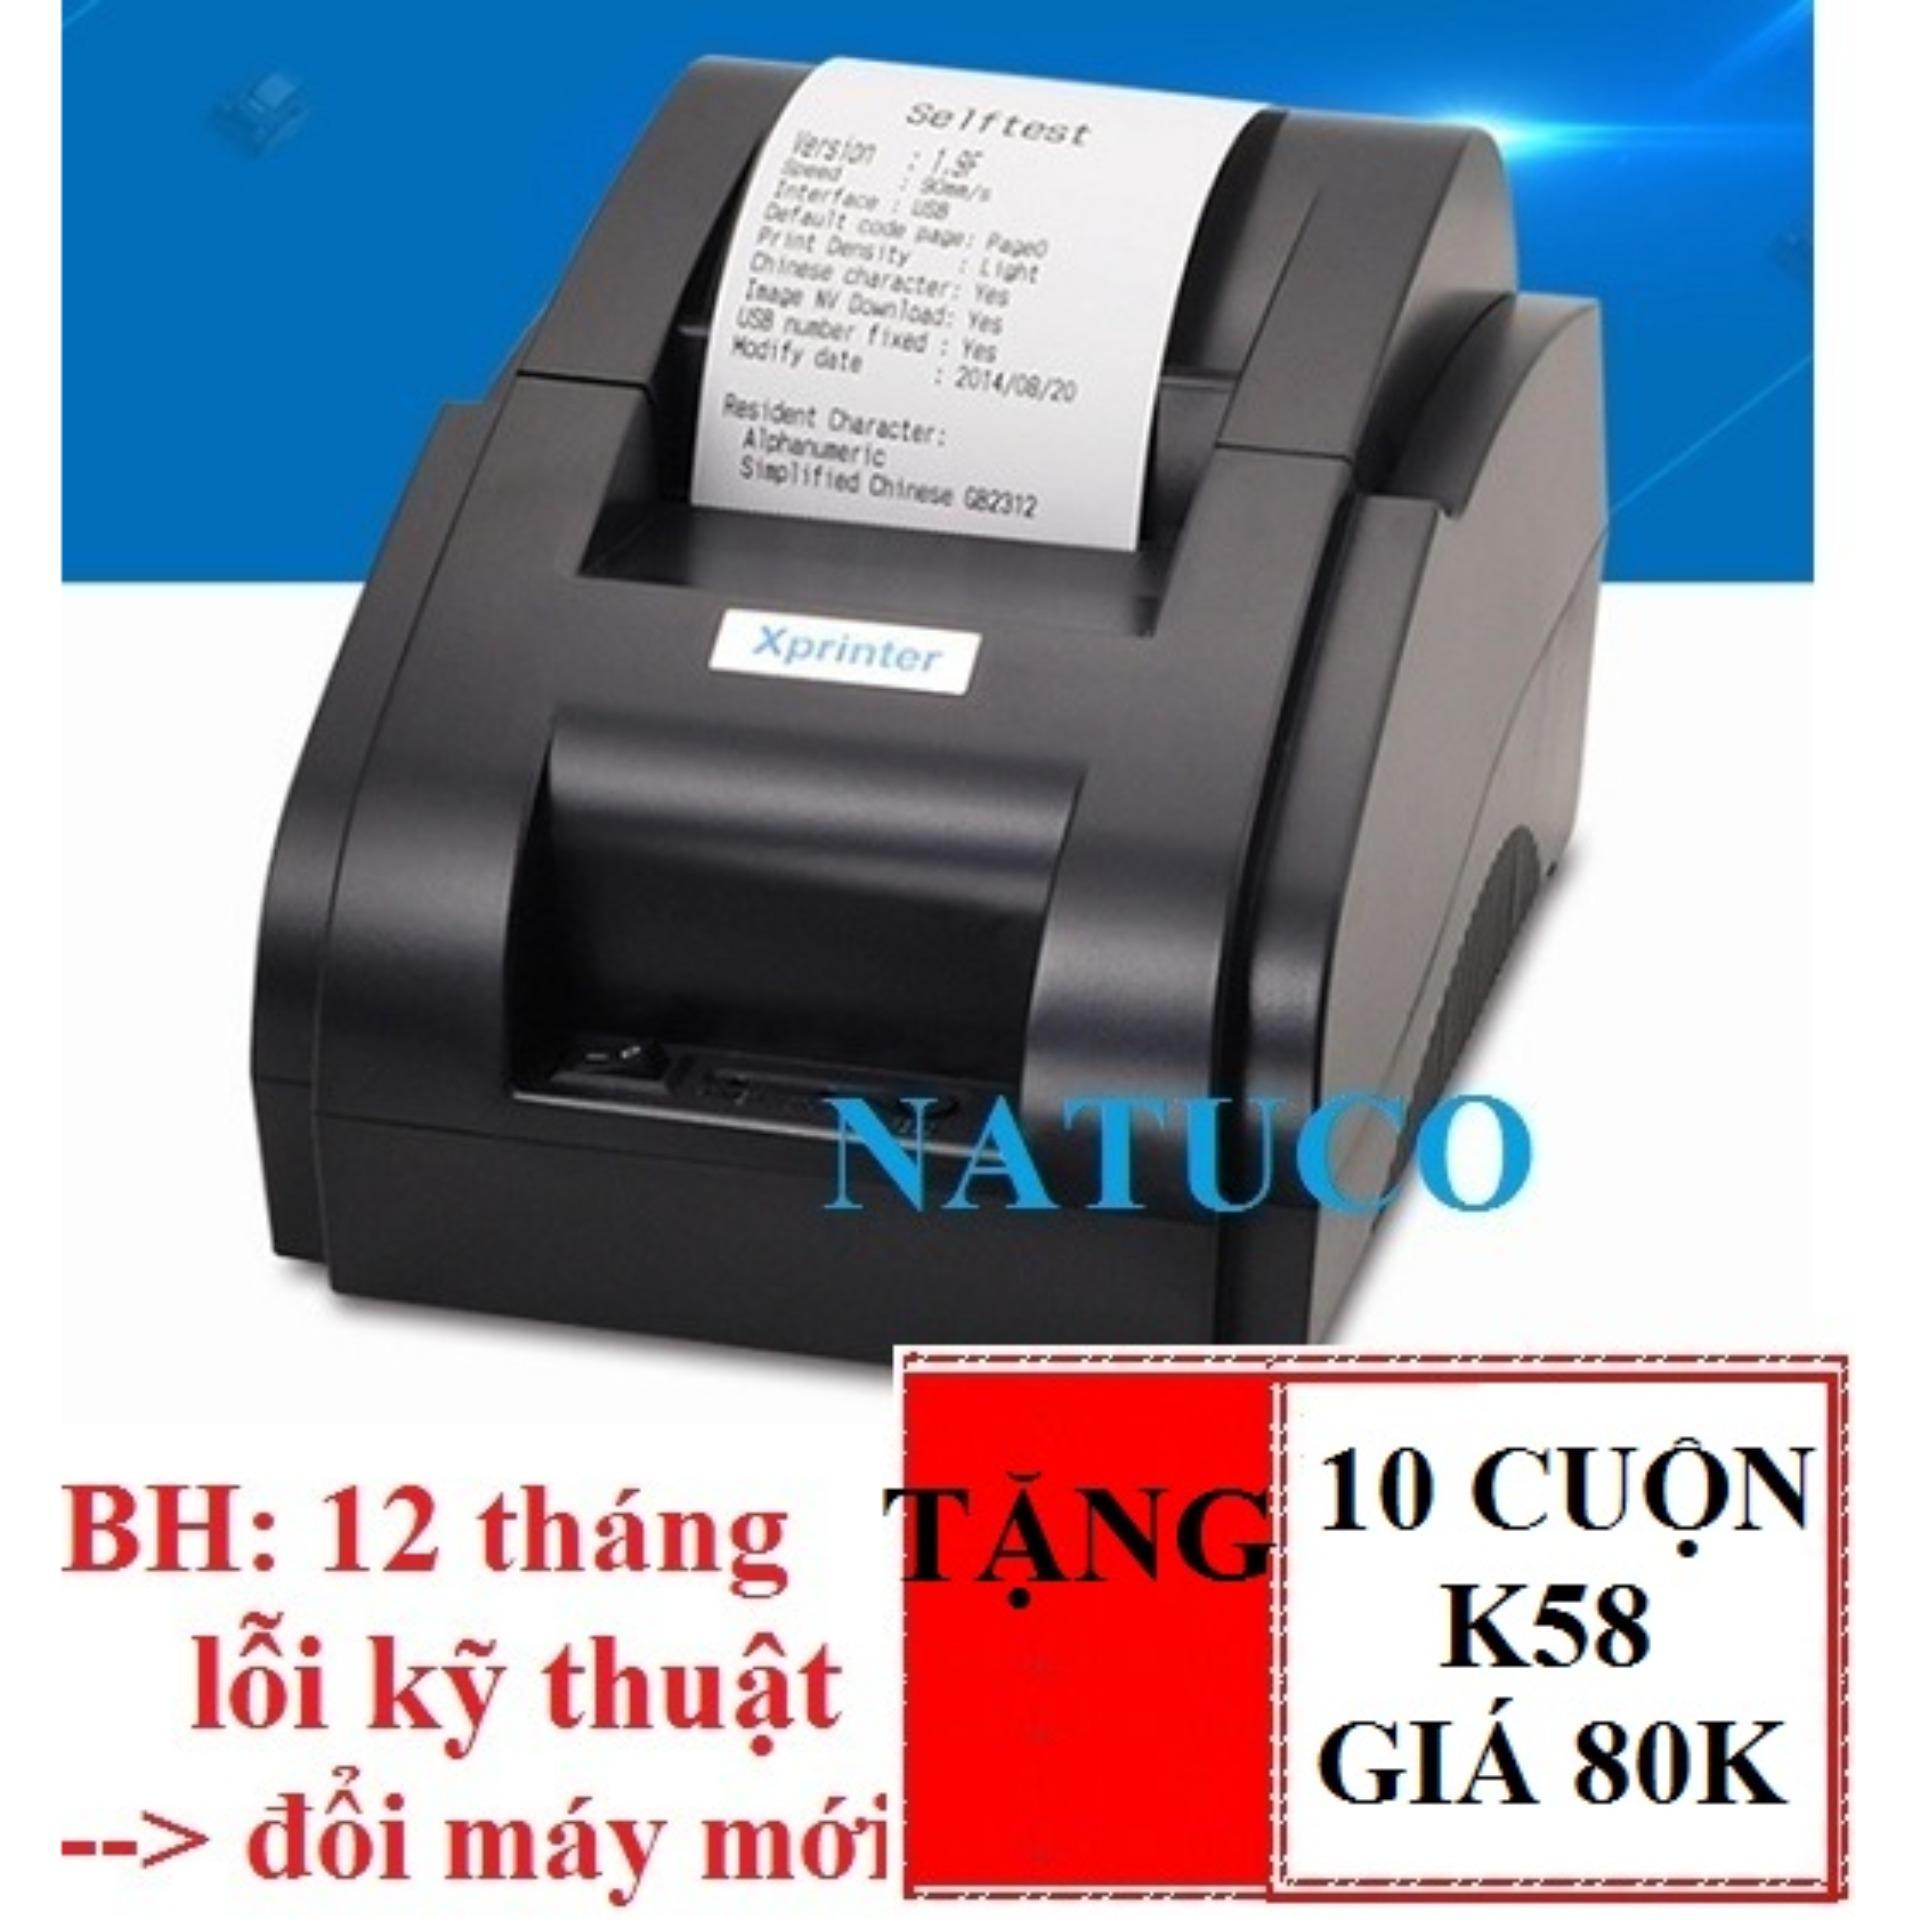 Xprinter Xpf58iihusb Xp Q200ii 80mm Thermal Printer Pos Kasir Auto Cutter Cash Receipt 58iih Usb